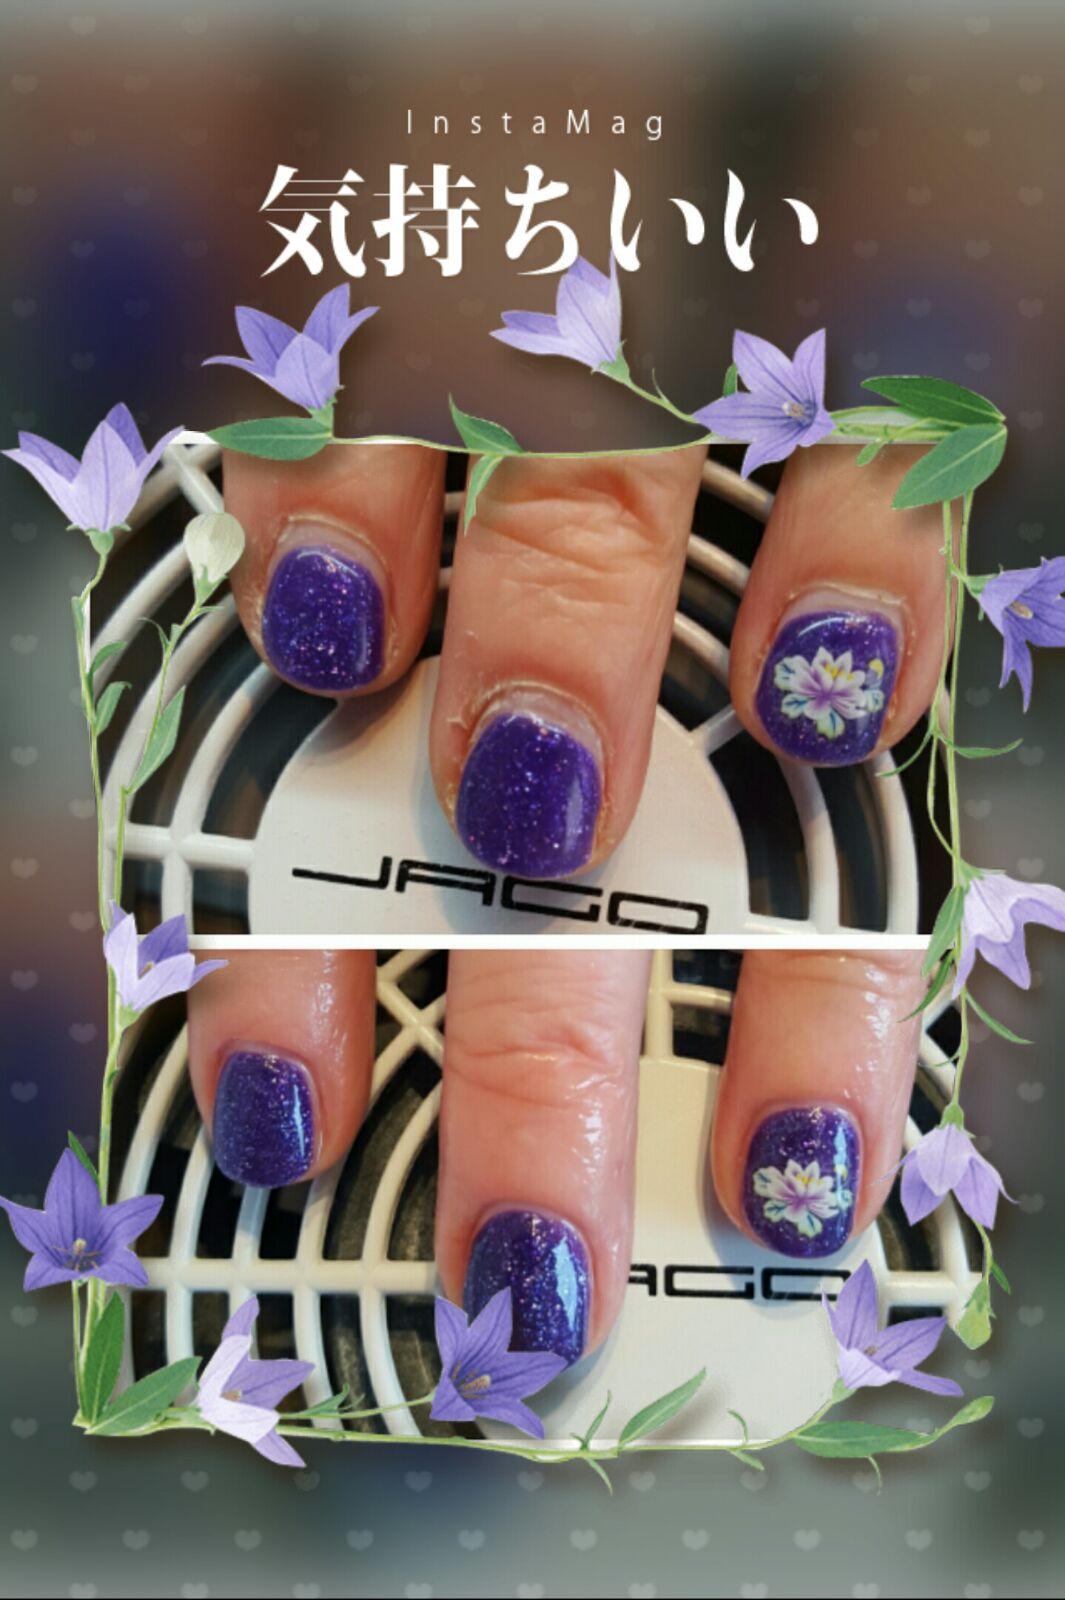 Maniküre 8 Kosmetikstudio Papillon